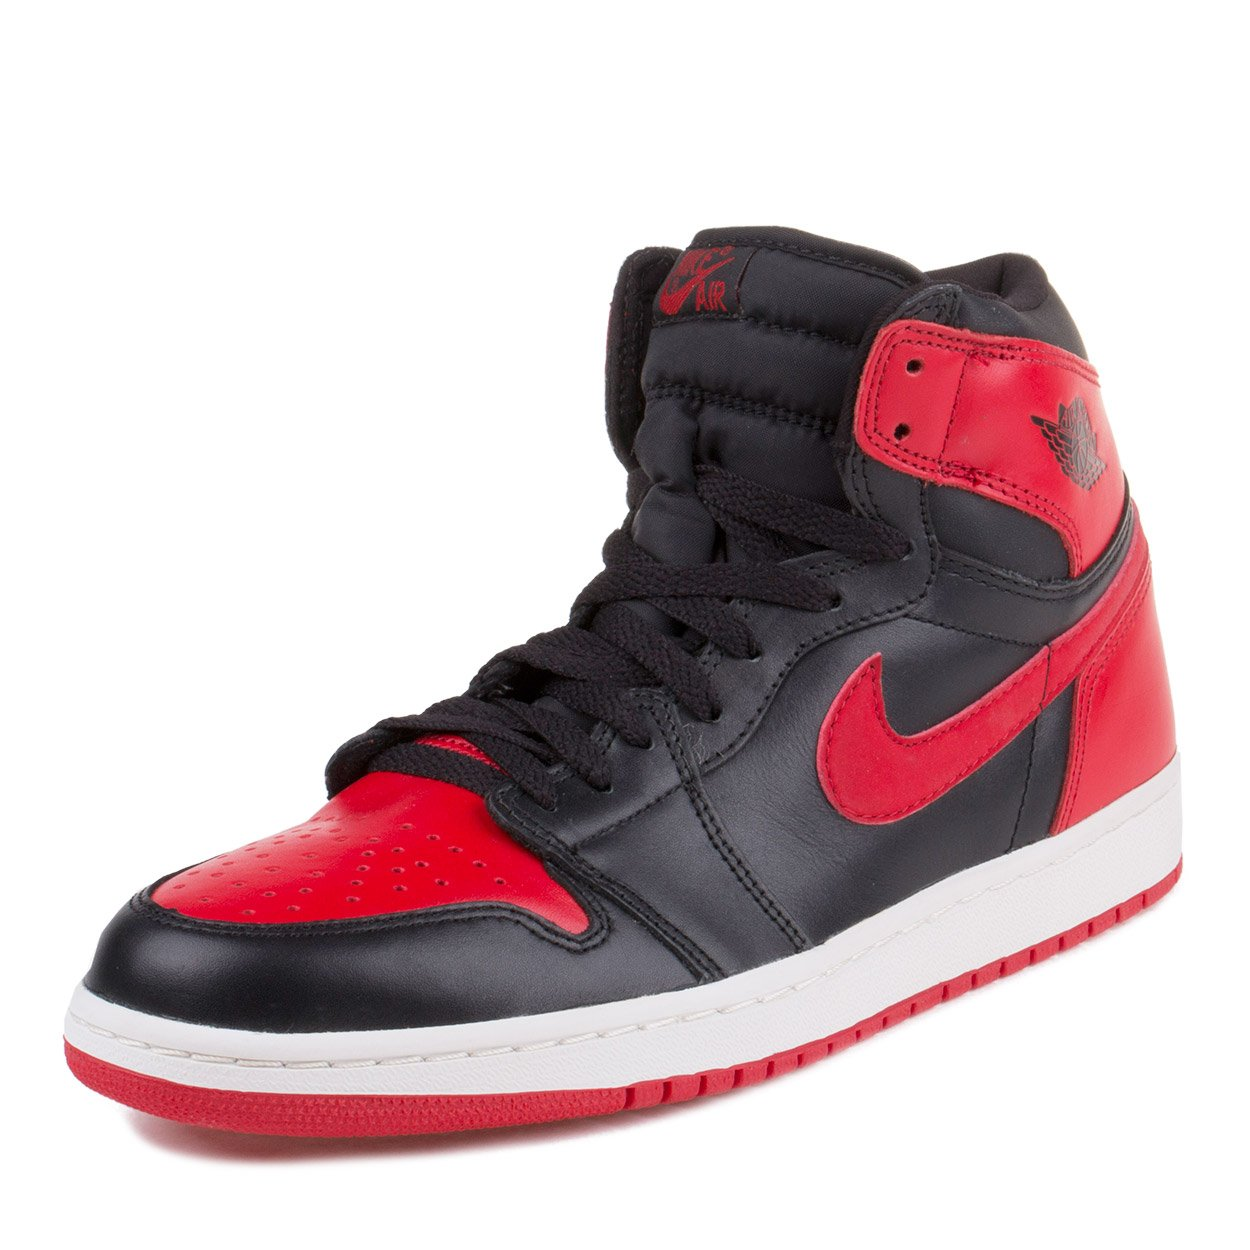 Nike Mens Air Jordan 1 Retro ''2001 Bred'' Black/Varsity Red Leather by NIKE